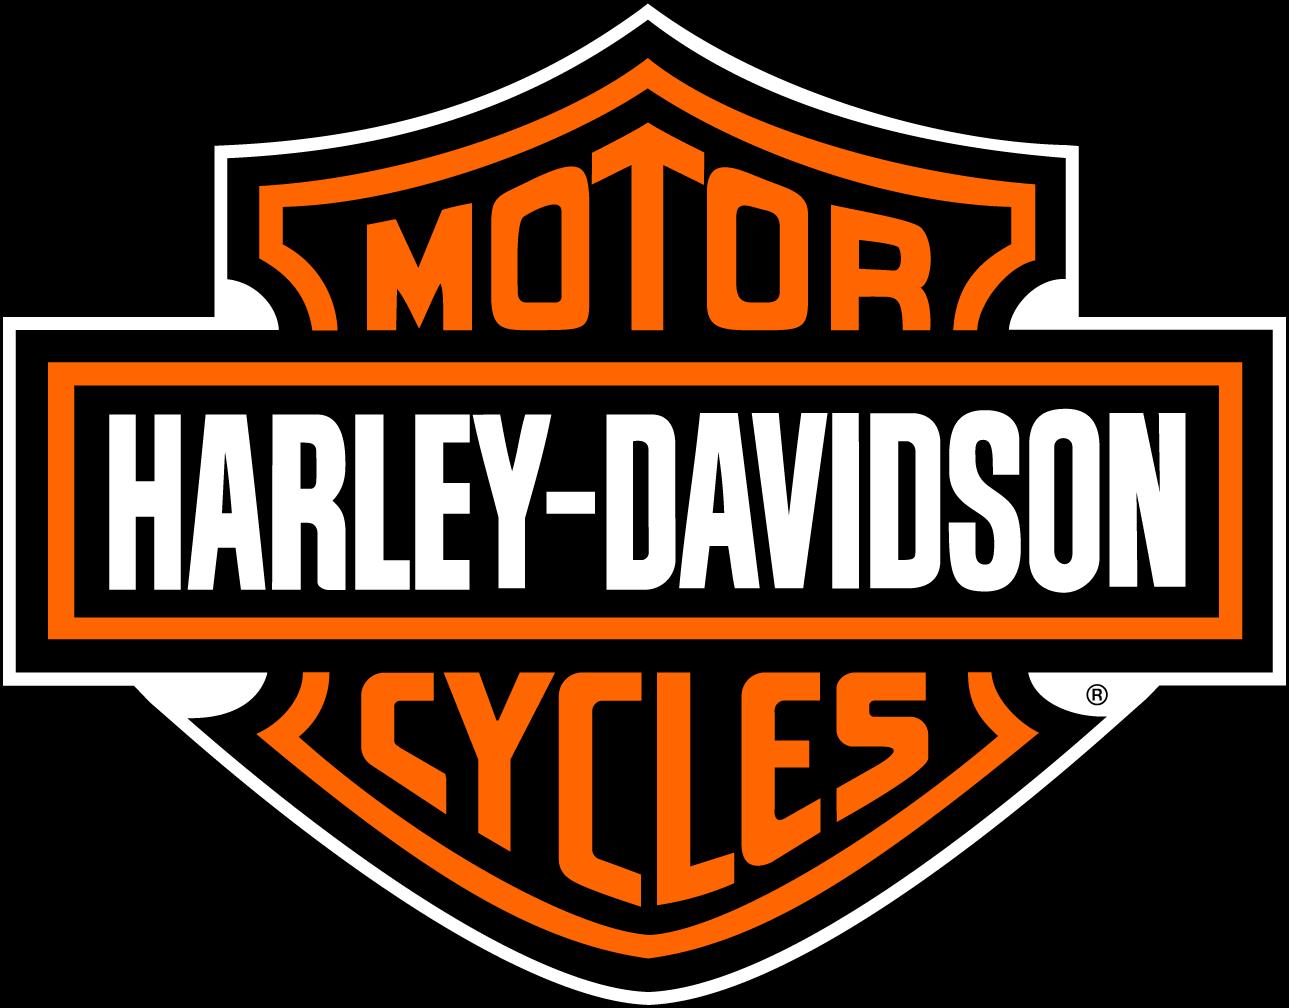 Logo Harley Davidson Shop